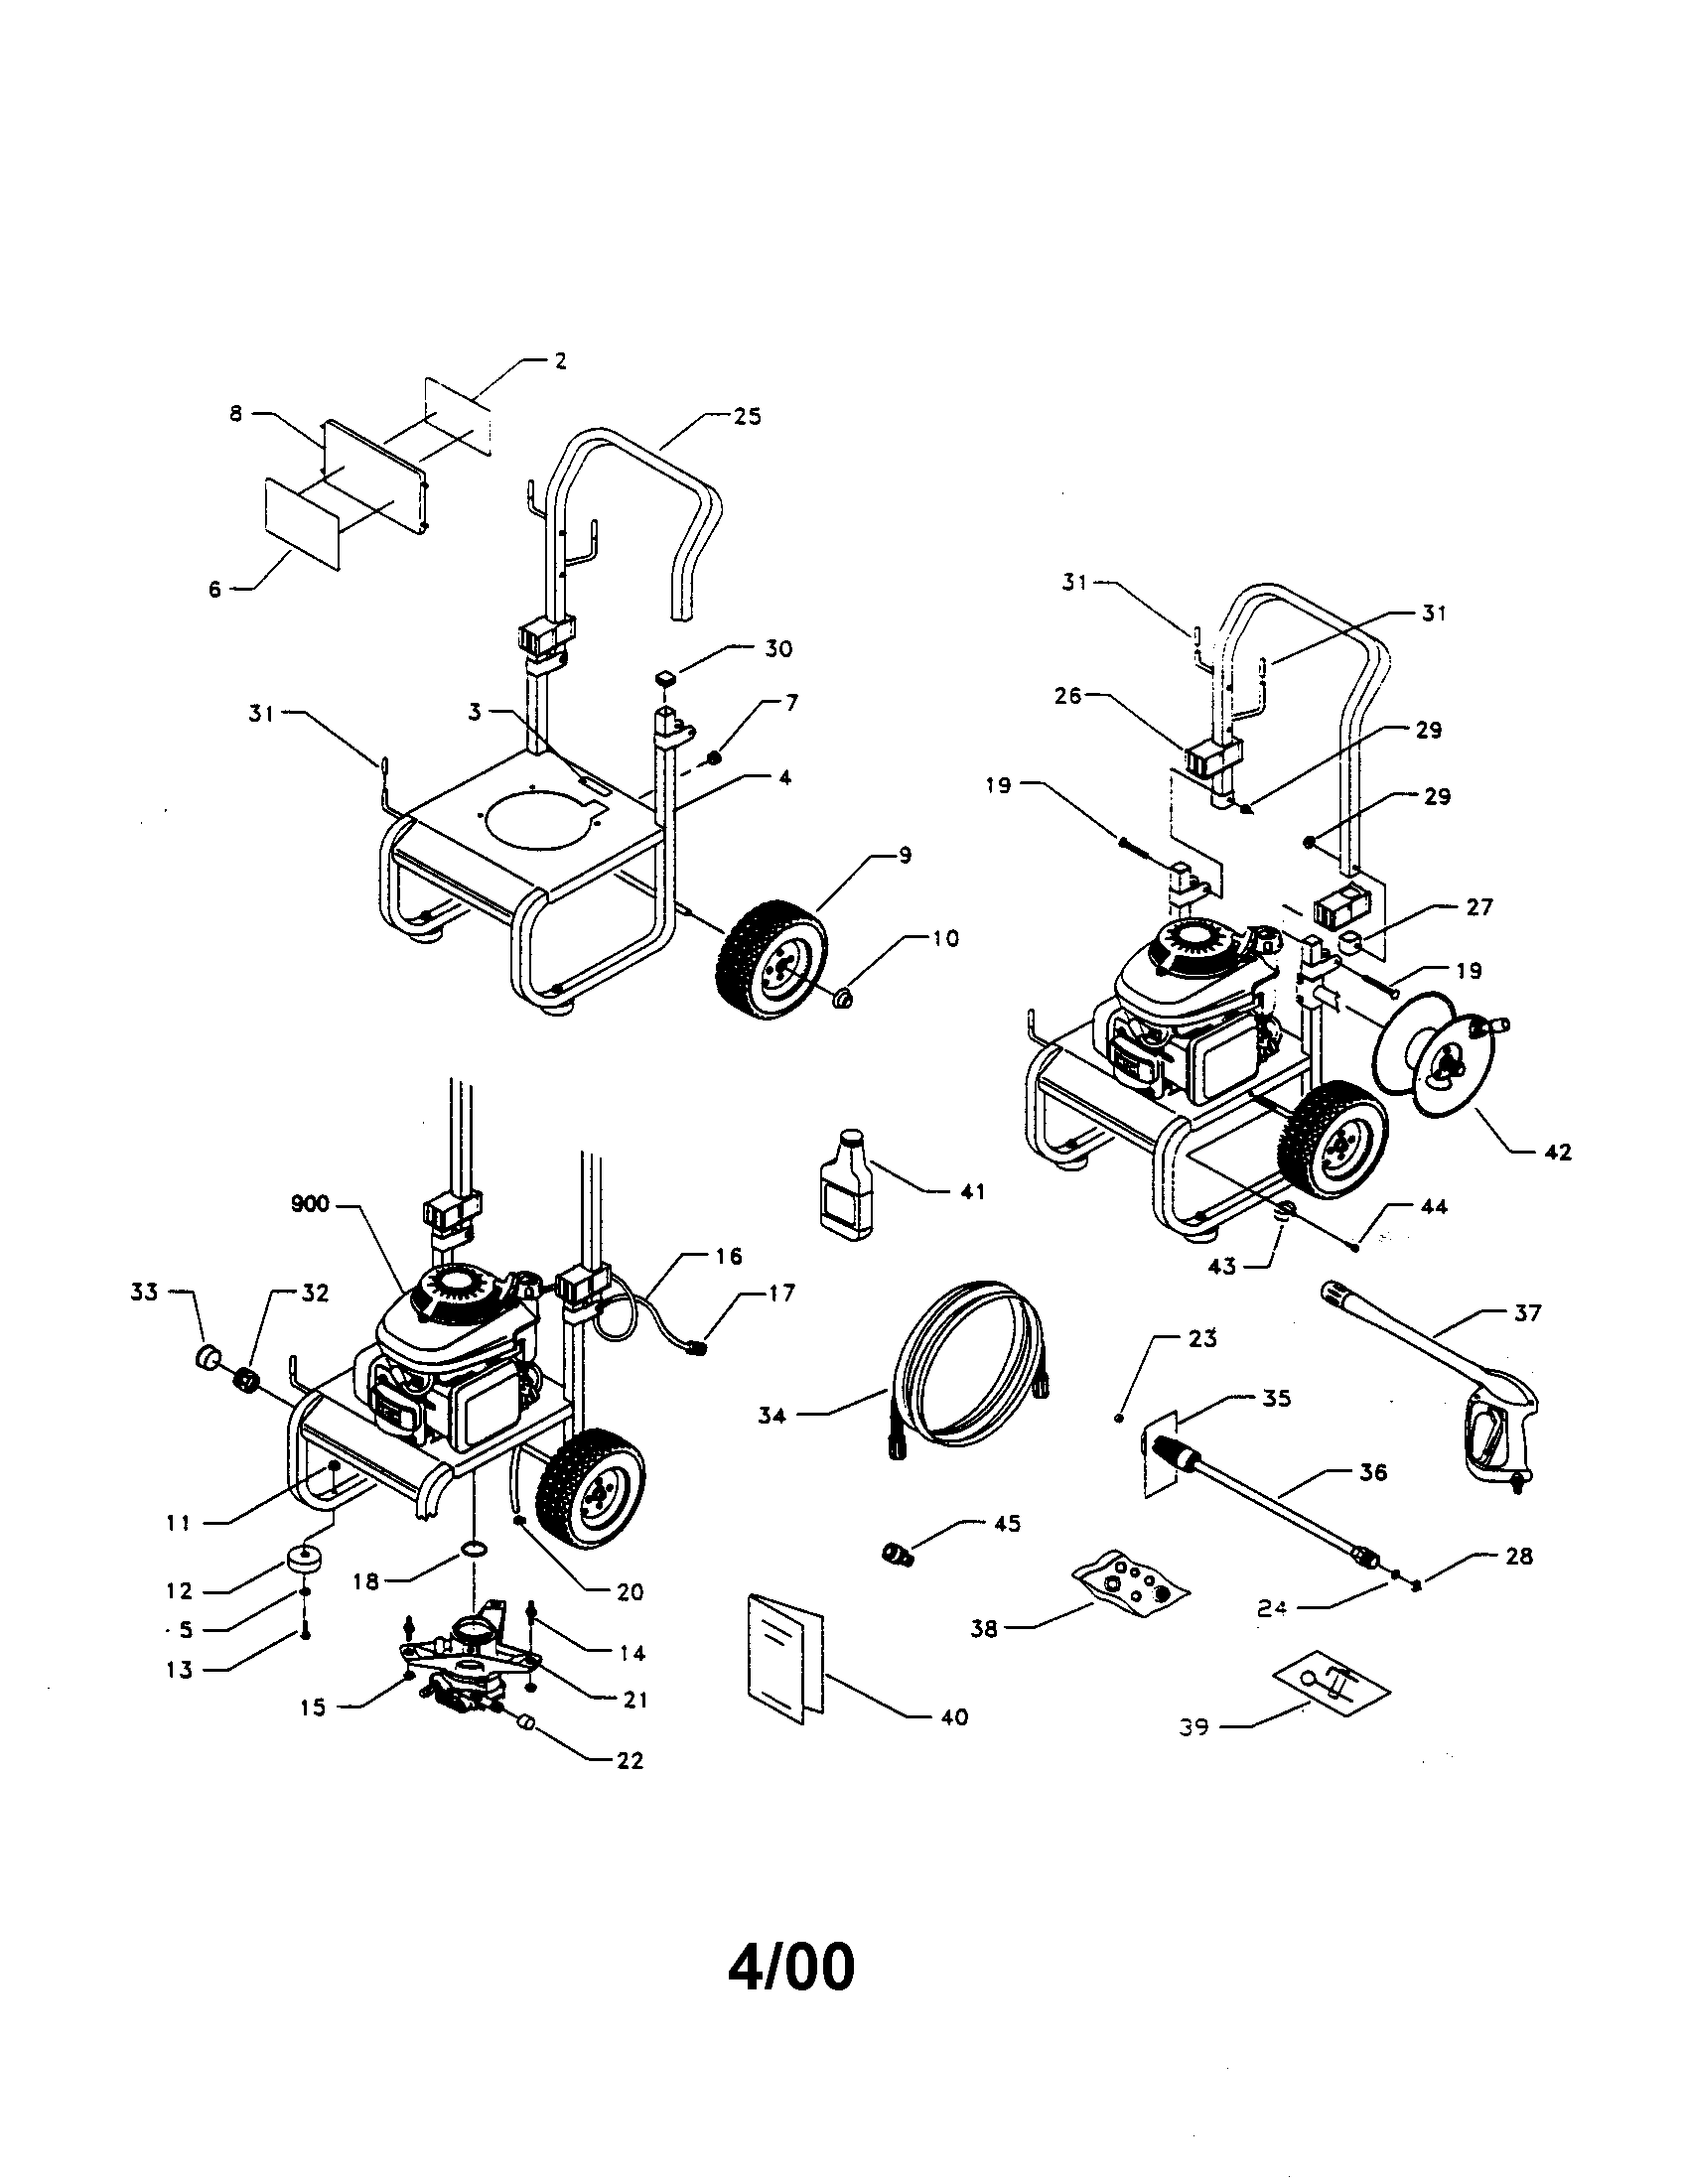 Craftsman model 580768341 power washer gas genuine parts p0040235 00001 1505200html honda 5 5 engine parts diagram honda 5 5 engine parts diagram